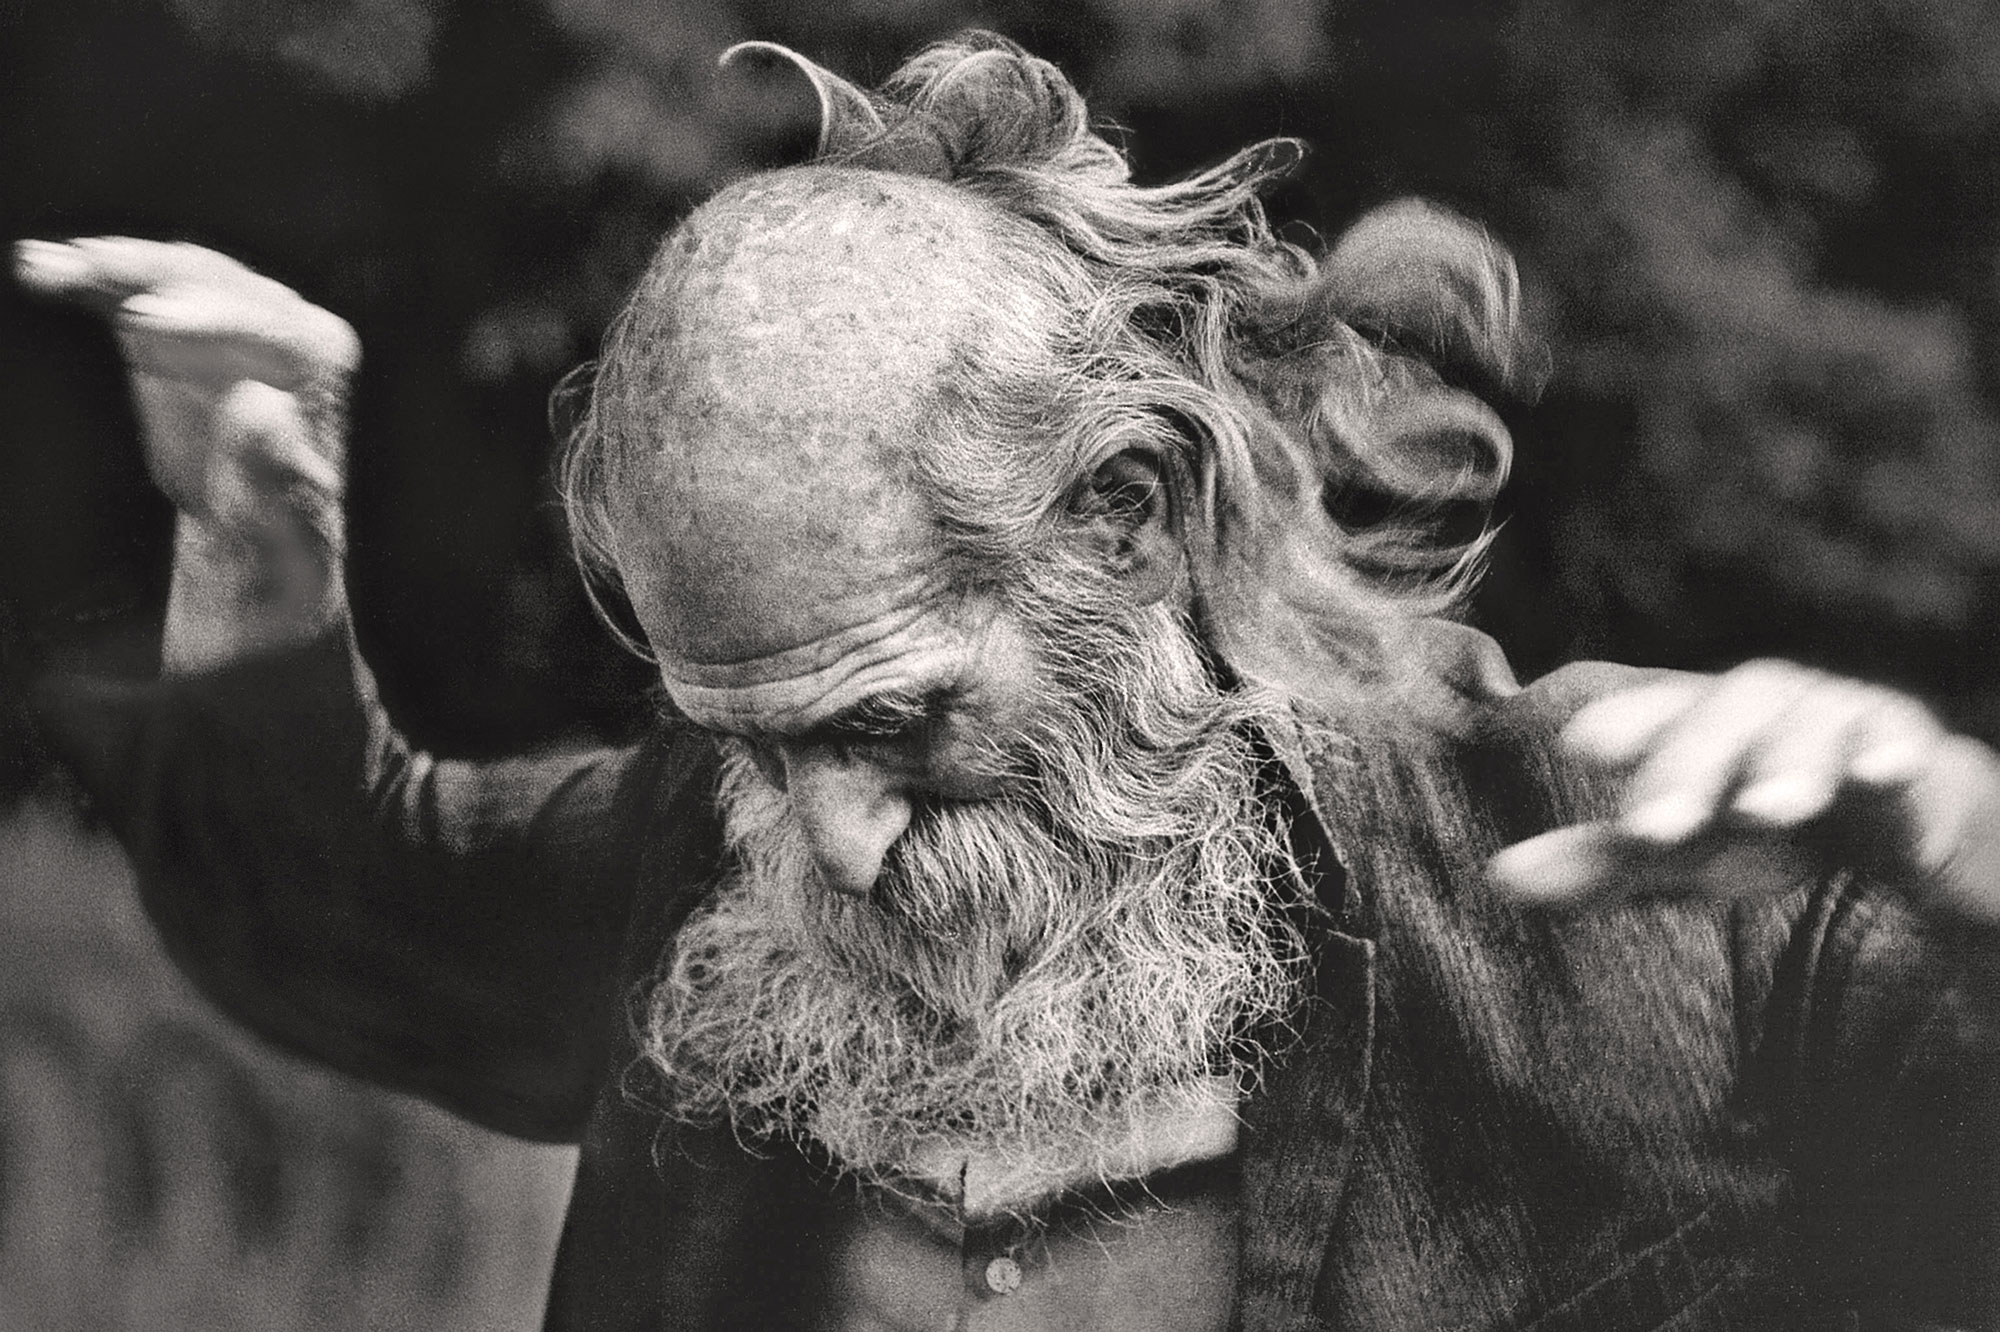 The Dance Of Zlatio Zlatev | Jacko Vassilev – The Joy of Freedom | Luz Art Los Angeles, CA